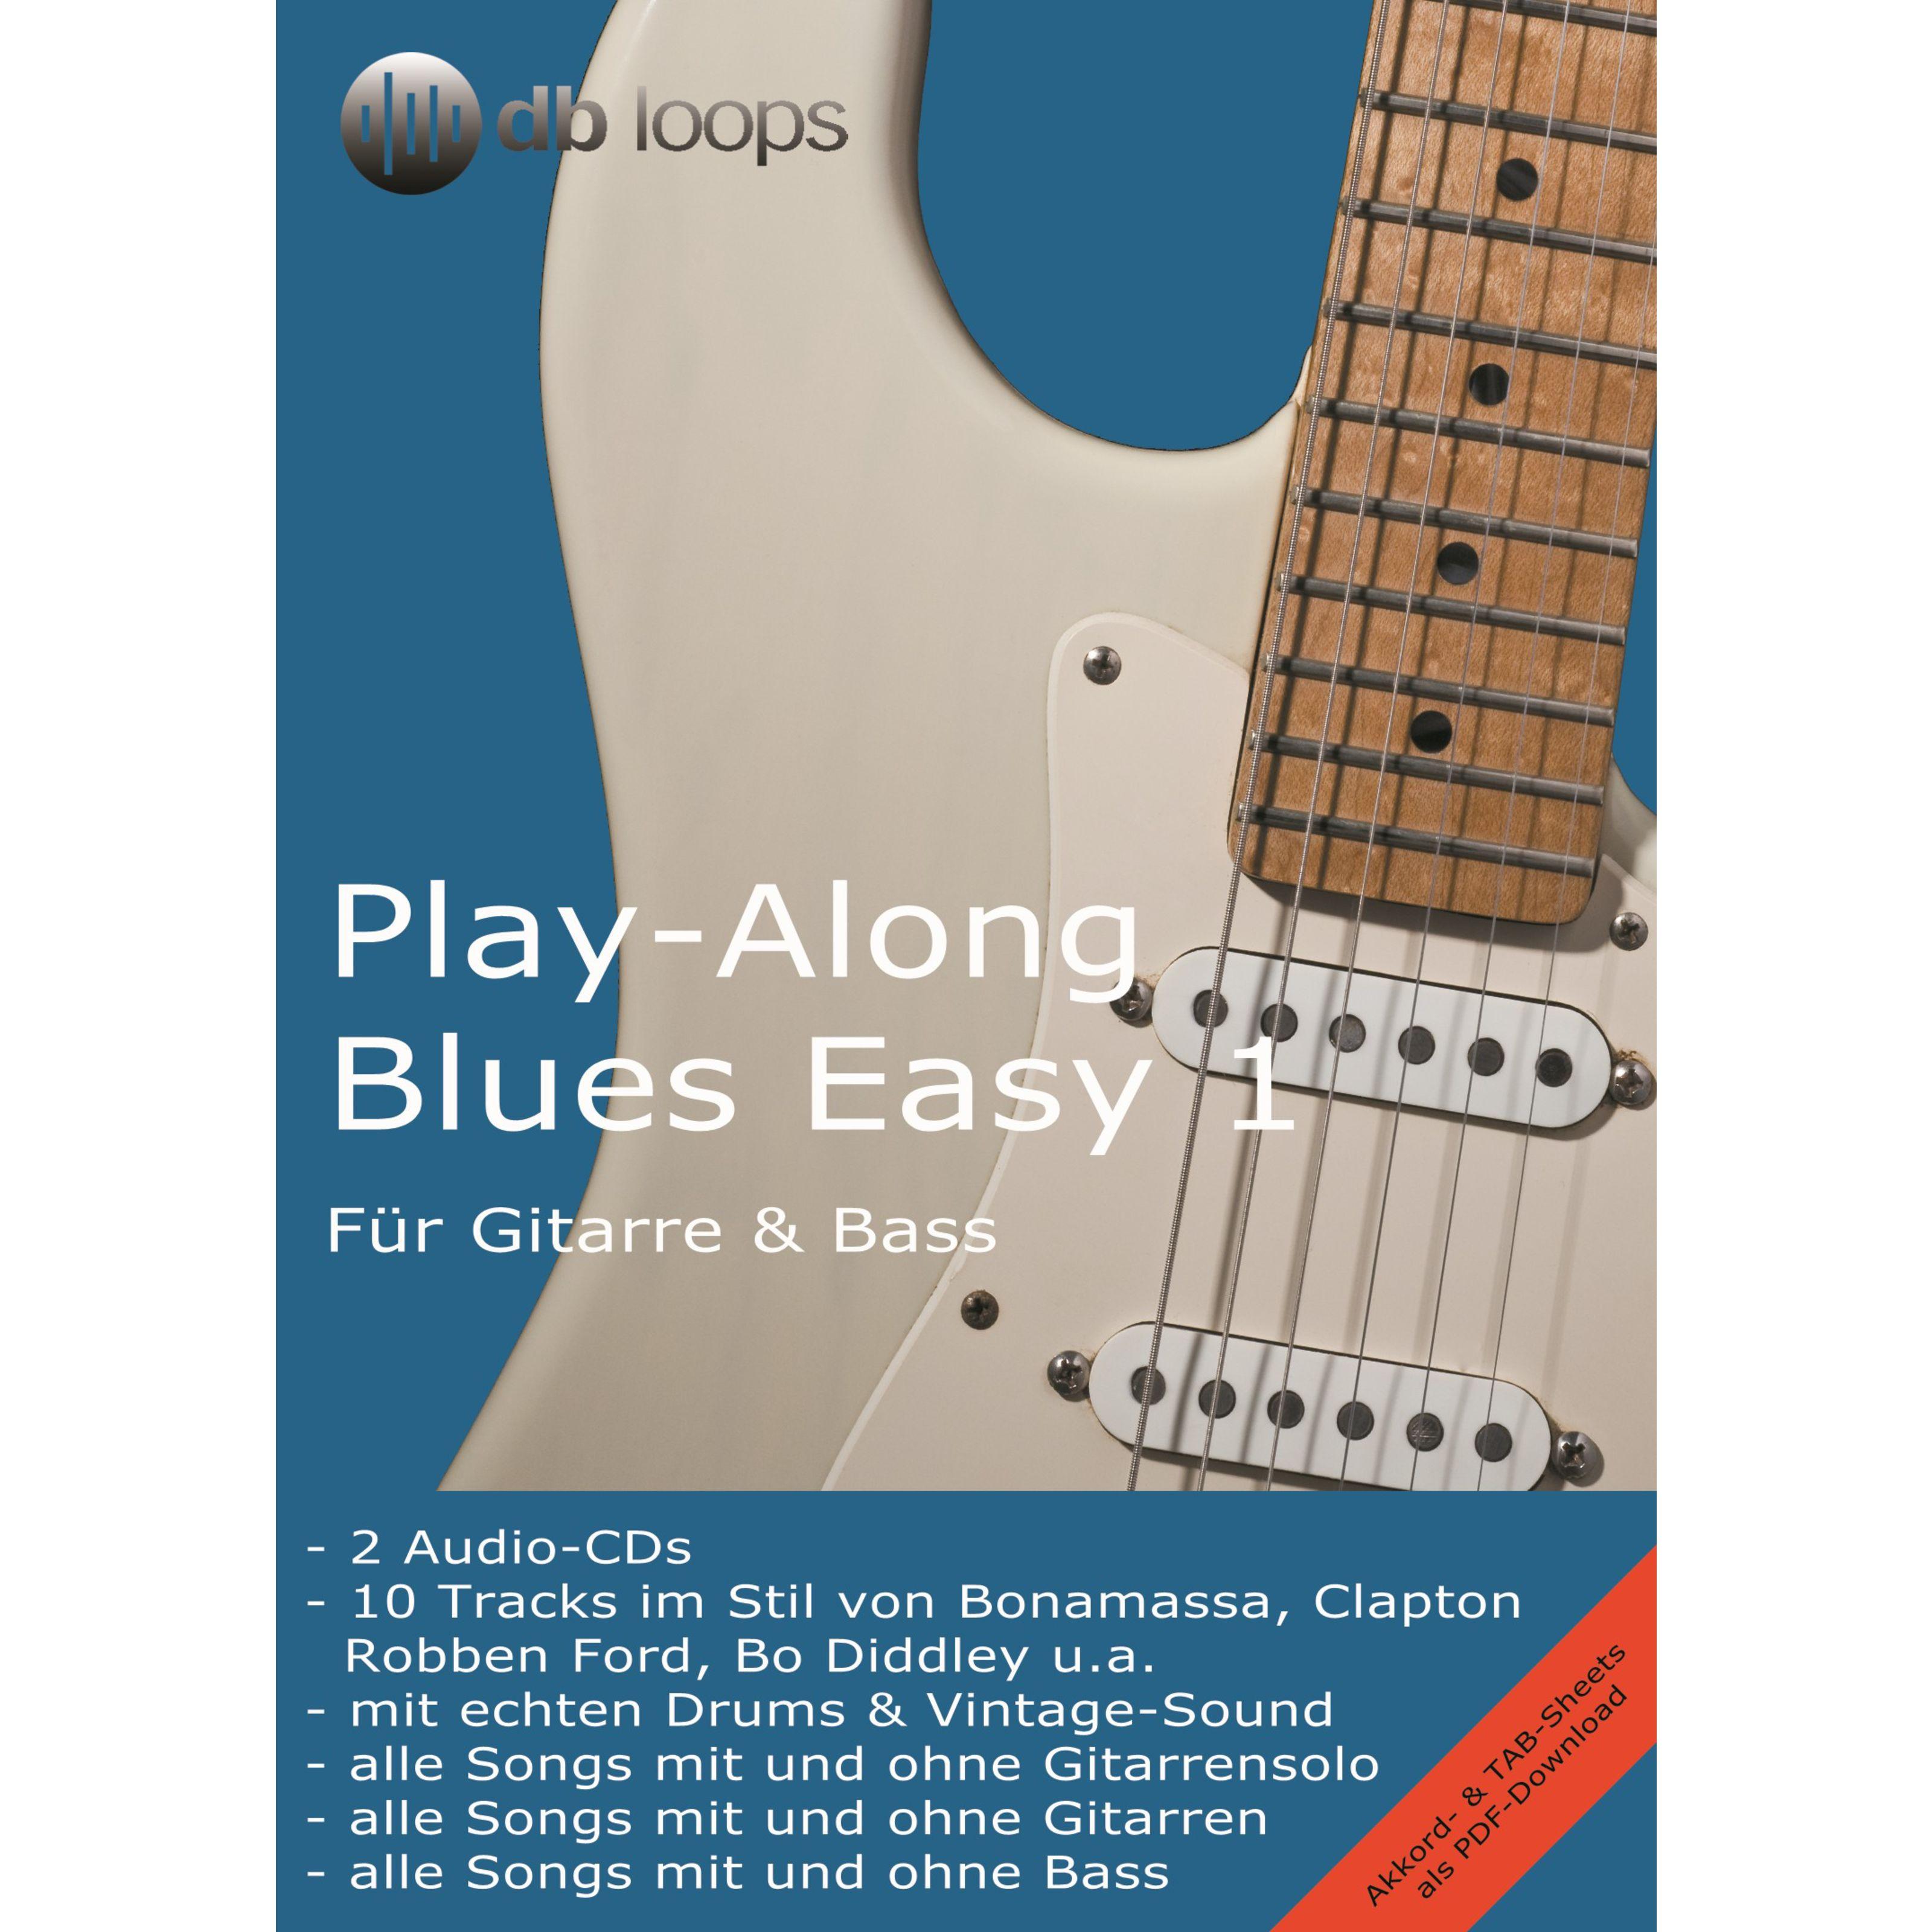 db loops - Blues - Easy 1 Gitarre Playalong